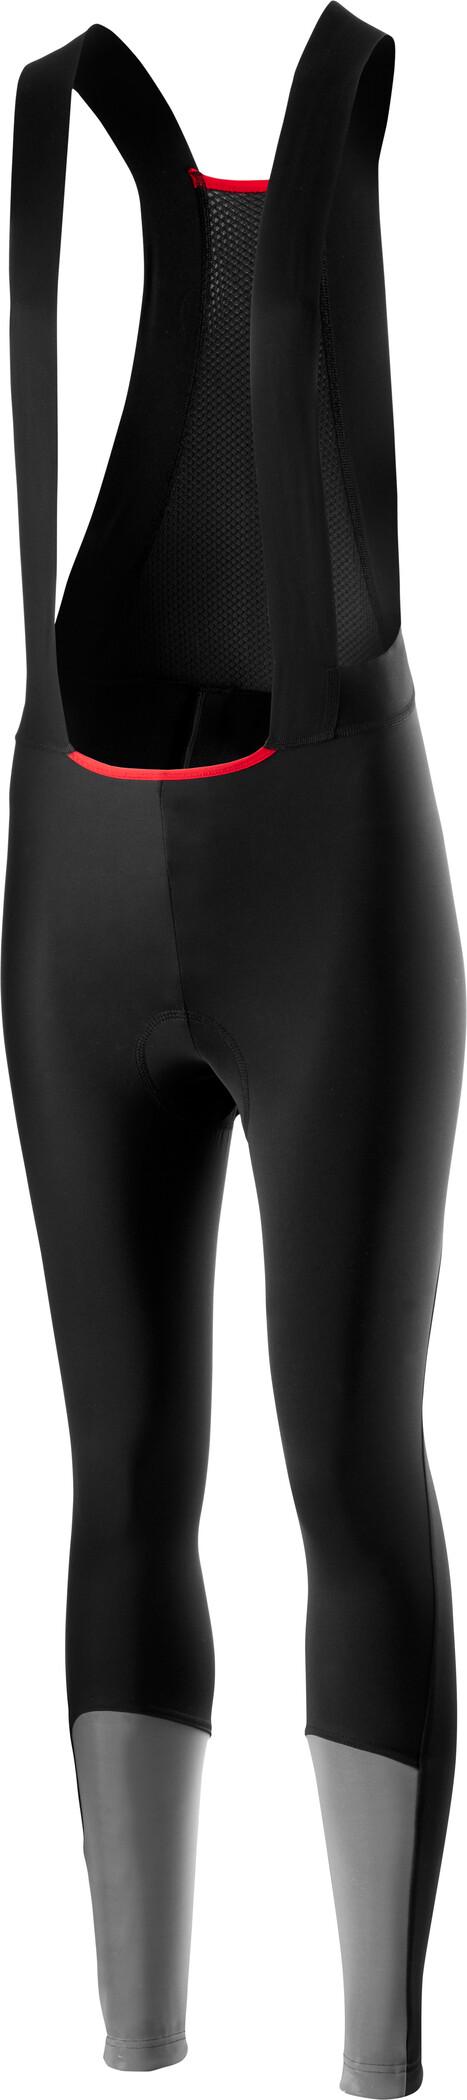 Castelli Nanoflex 2 Black Bib shorts